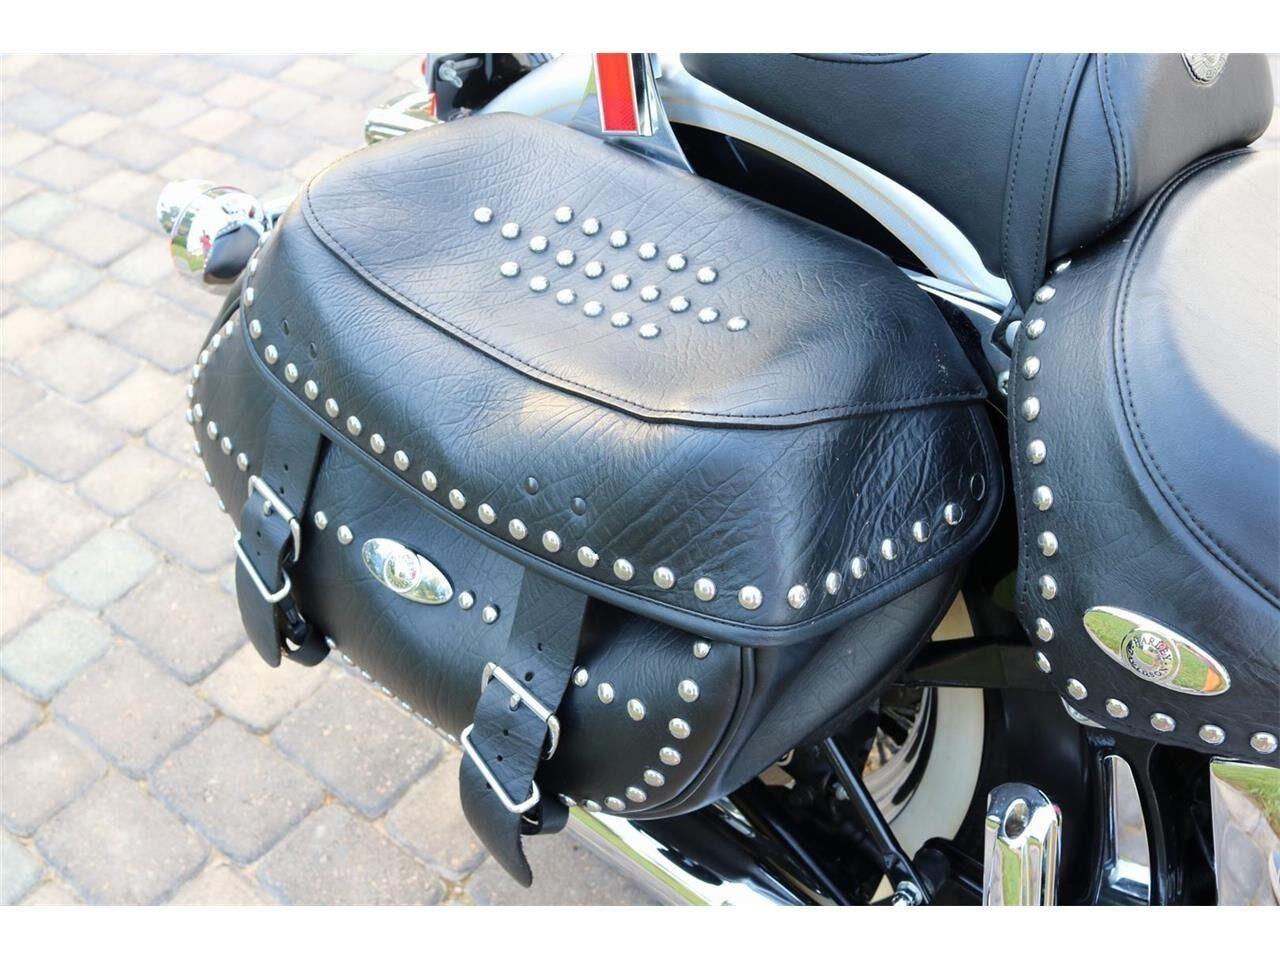 2003 Harley-Davidson FLSTCI (CC-1253051) for sale in Conroe, Texas